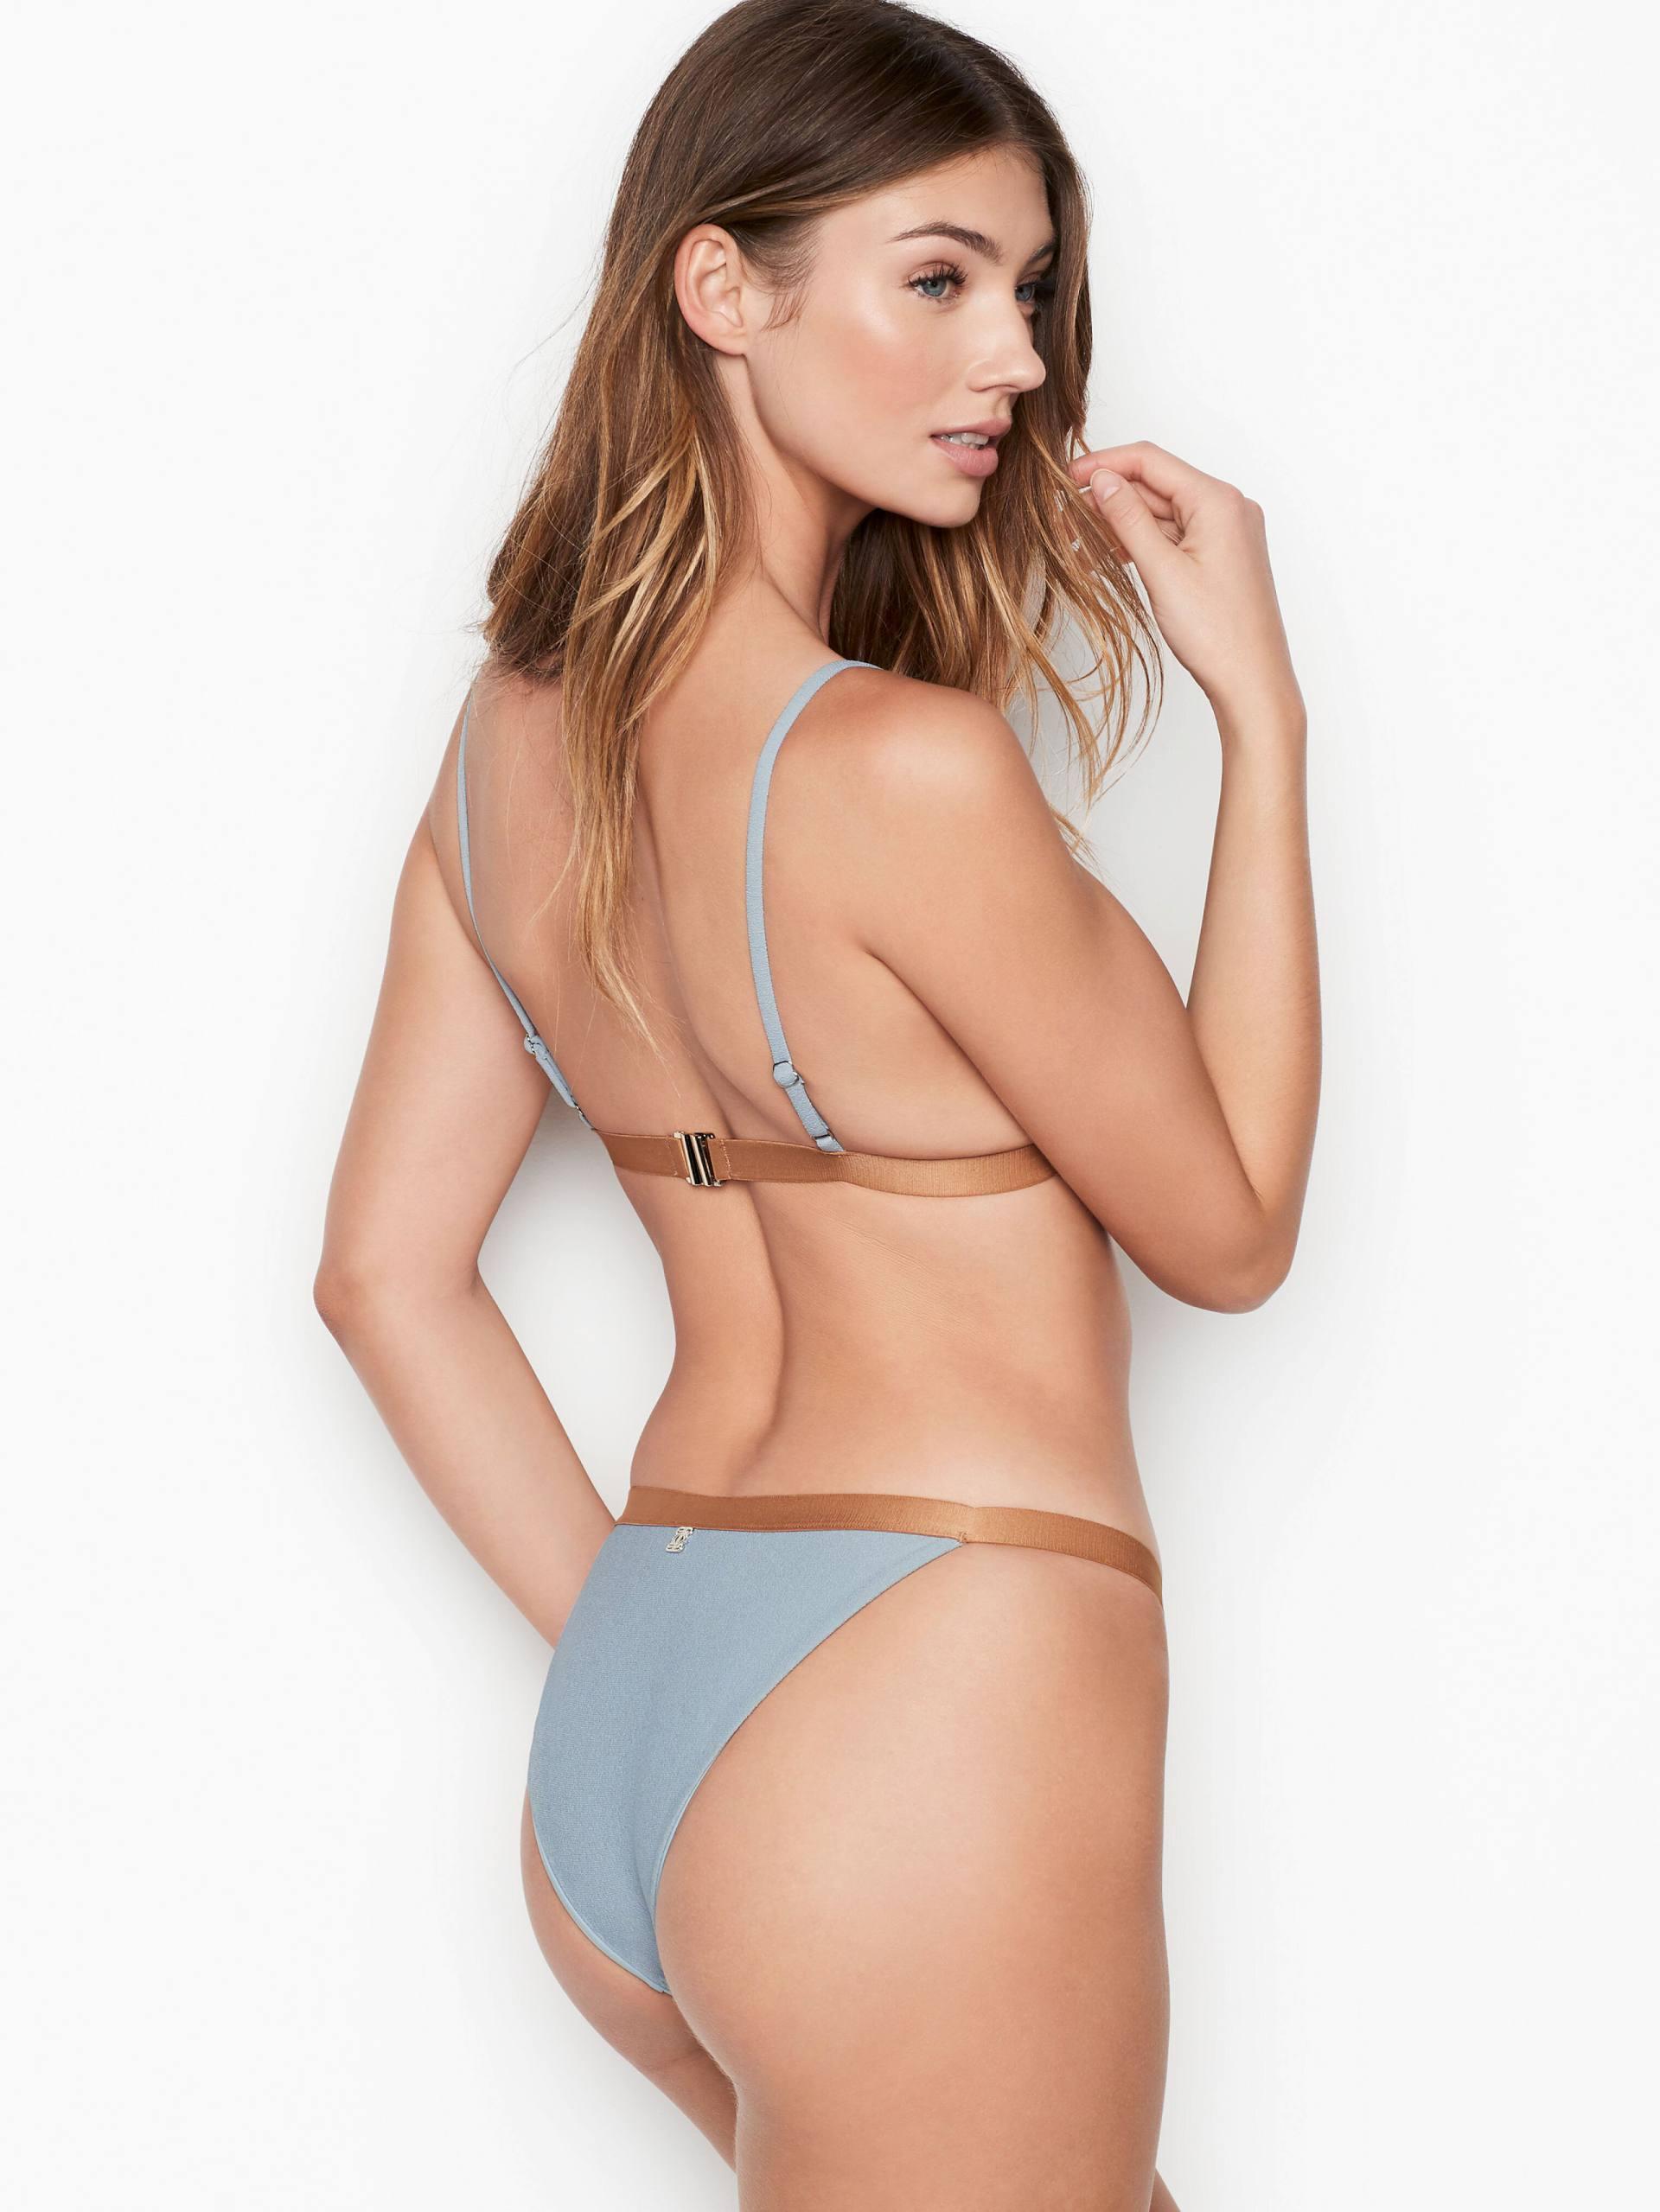 Lorena Rae Sexy Bikini Photoshoot